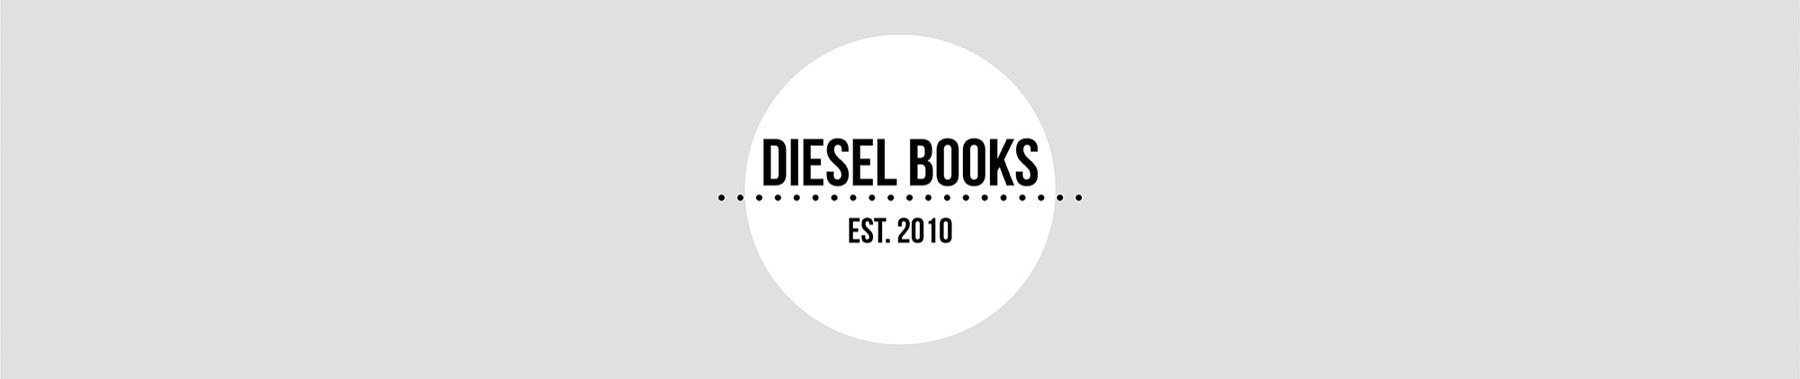 diesel books